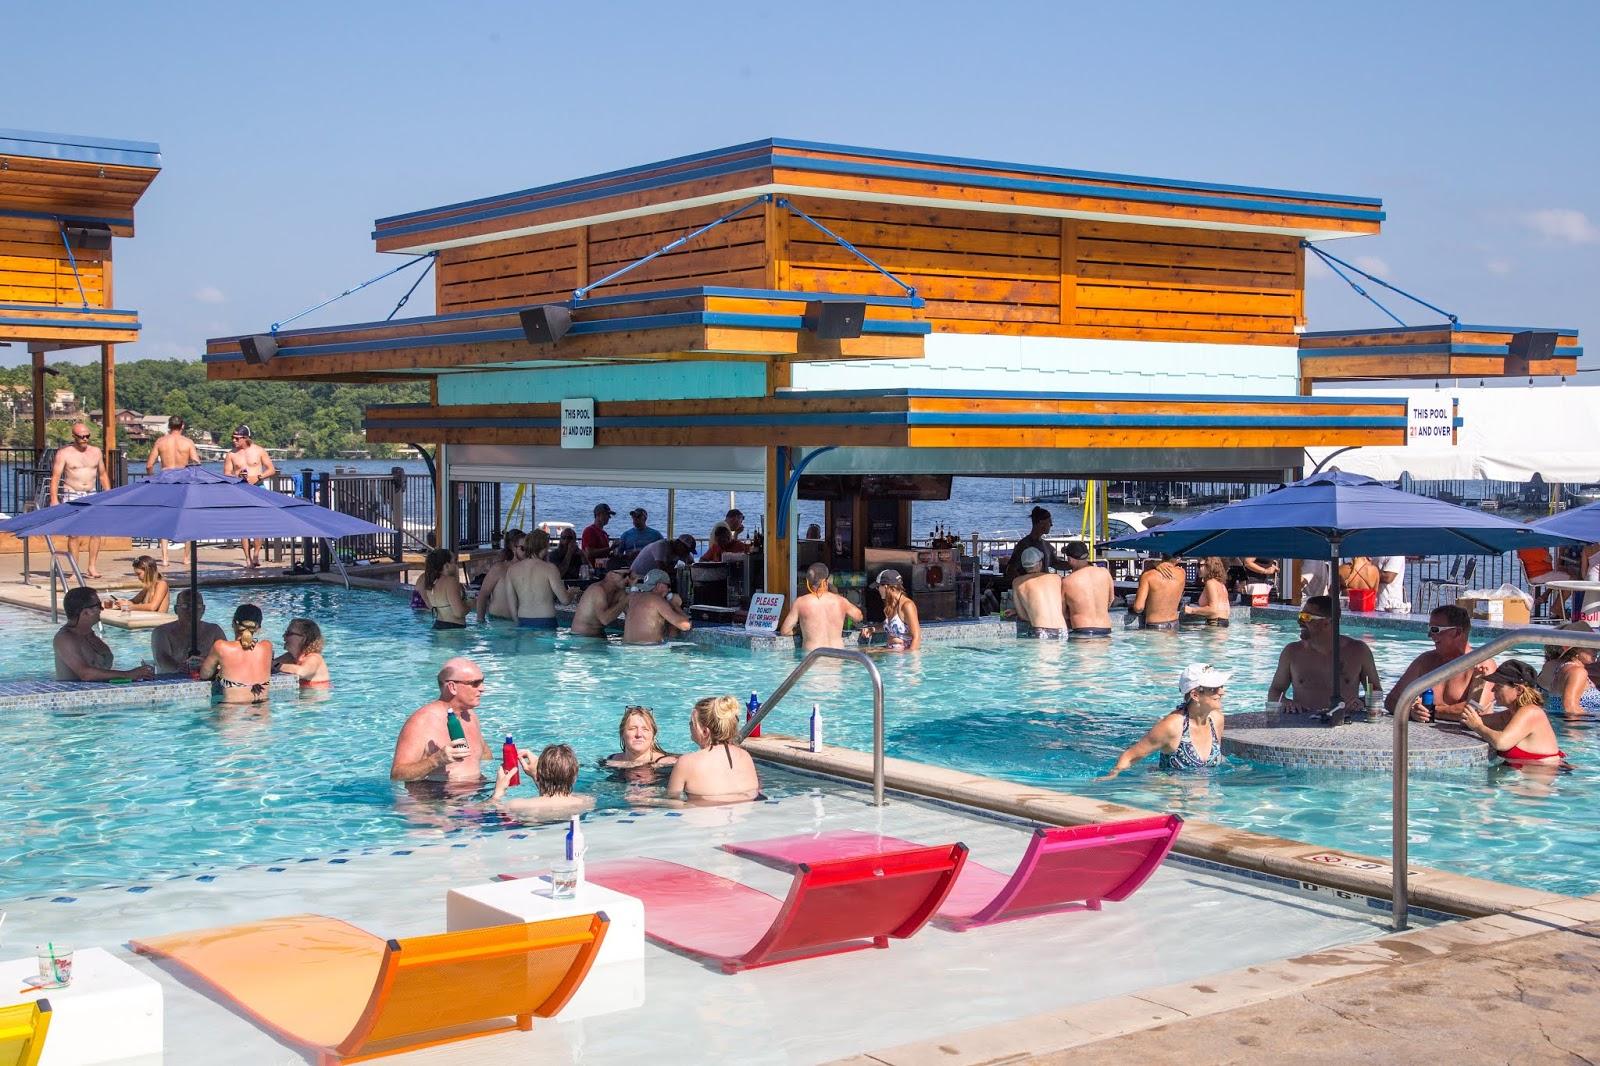 Dog Days Bar Amp Grill Lake Of The Ozarks 2019